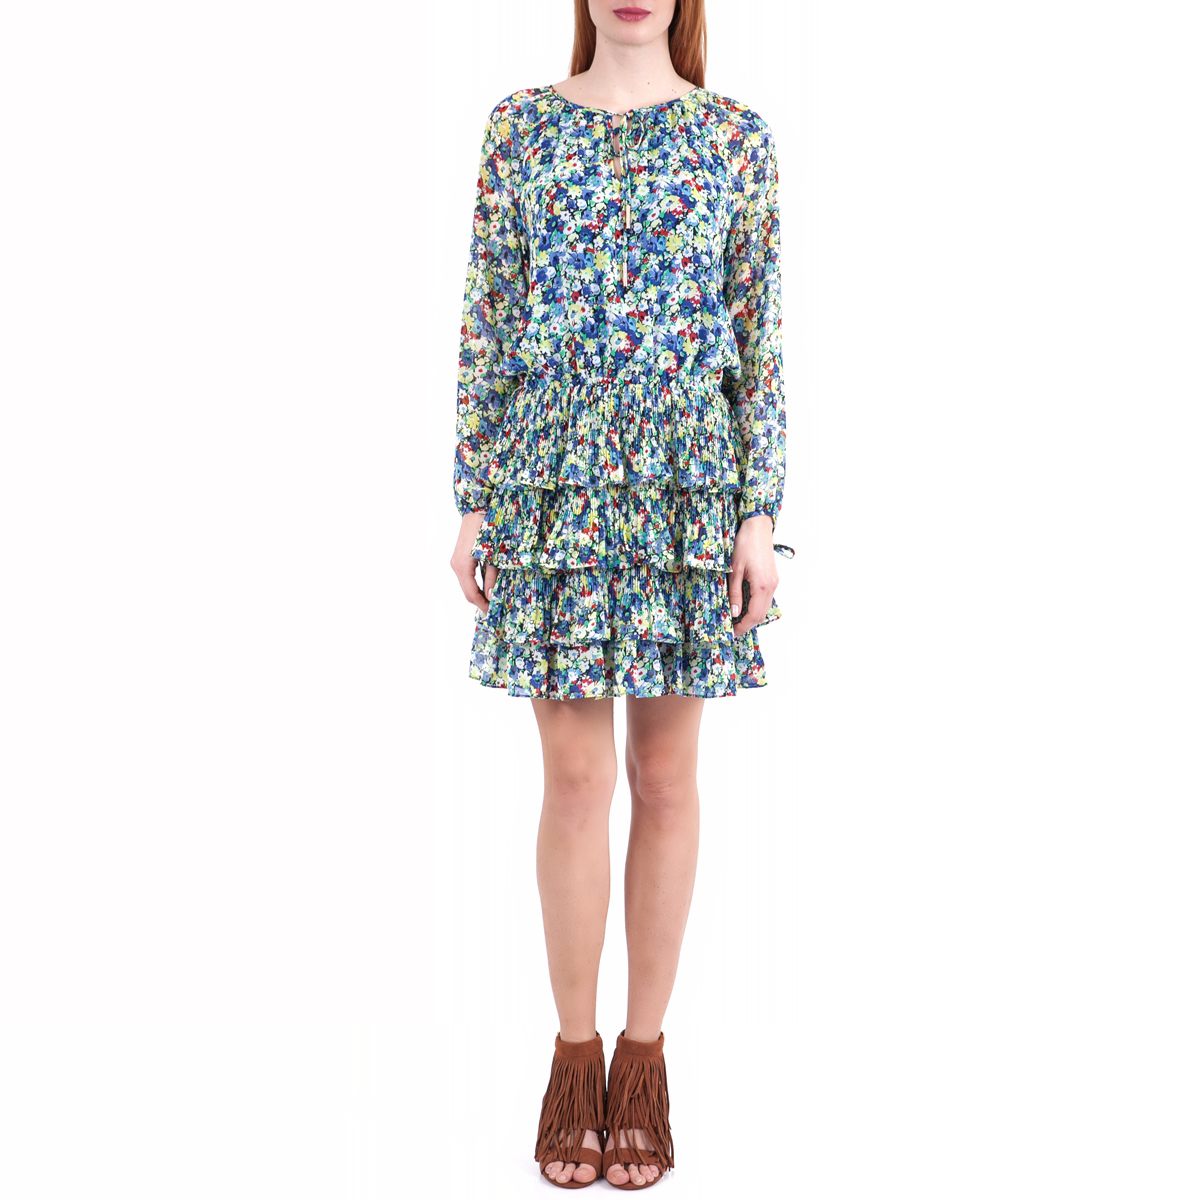 JUICY COUTURE - Γυναικείο φόρεμα Juicy Couture μπλε-πράσινο γυναικεία ρούχα φορέματα μίνι